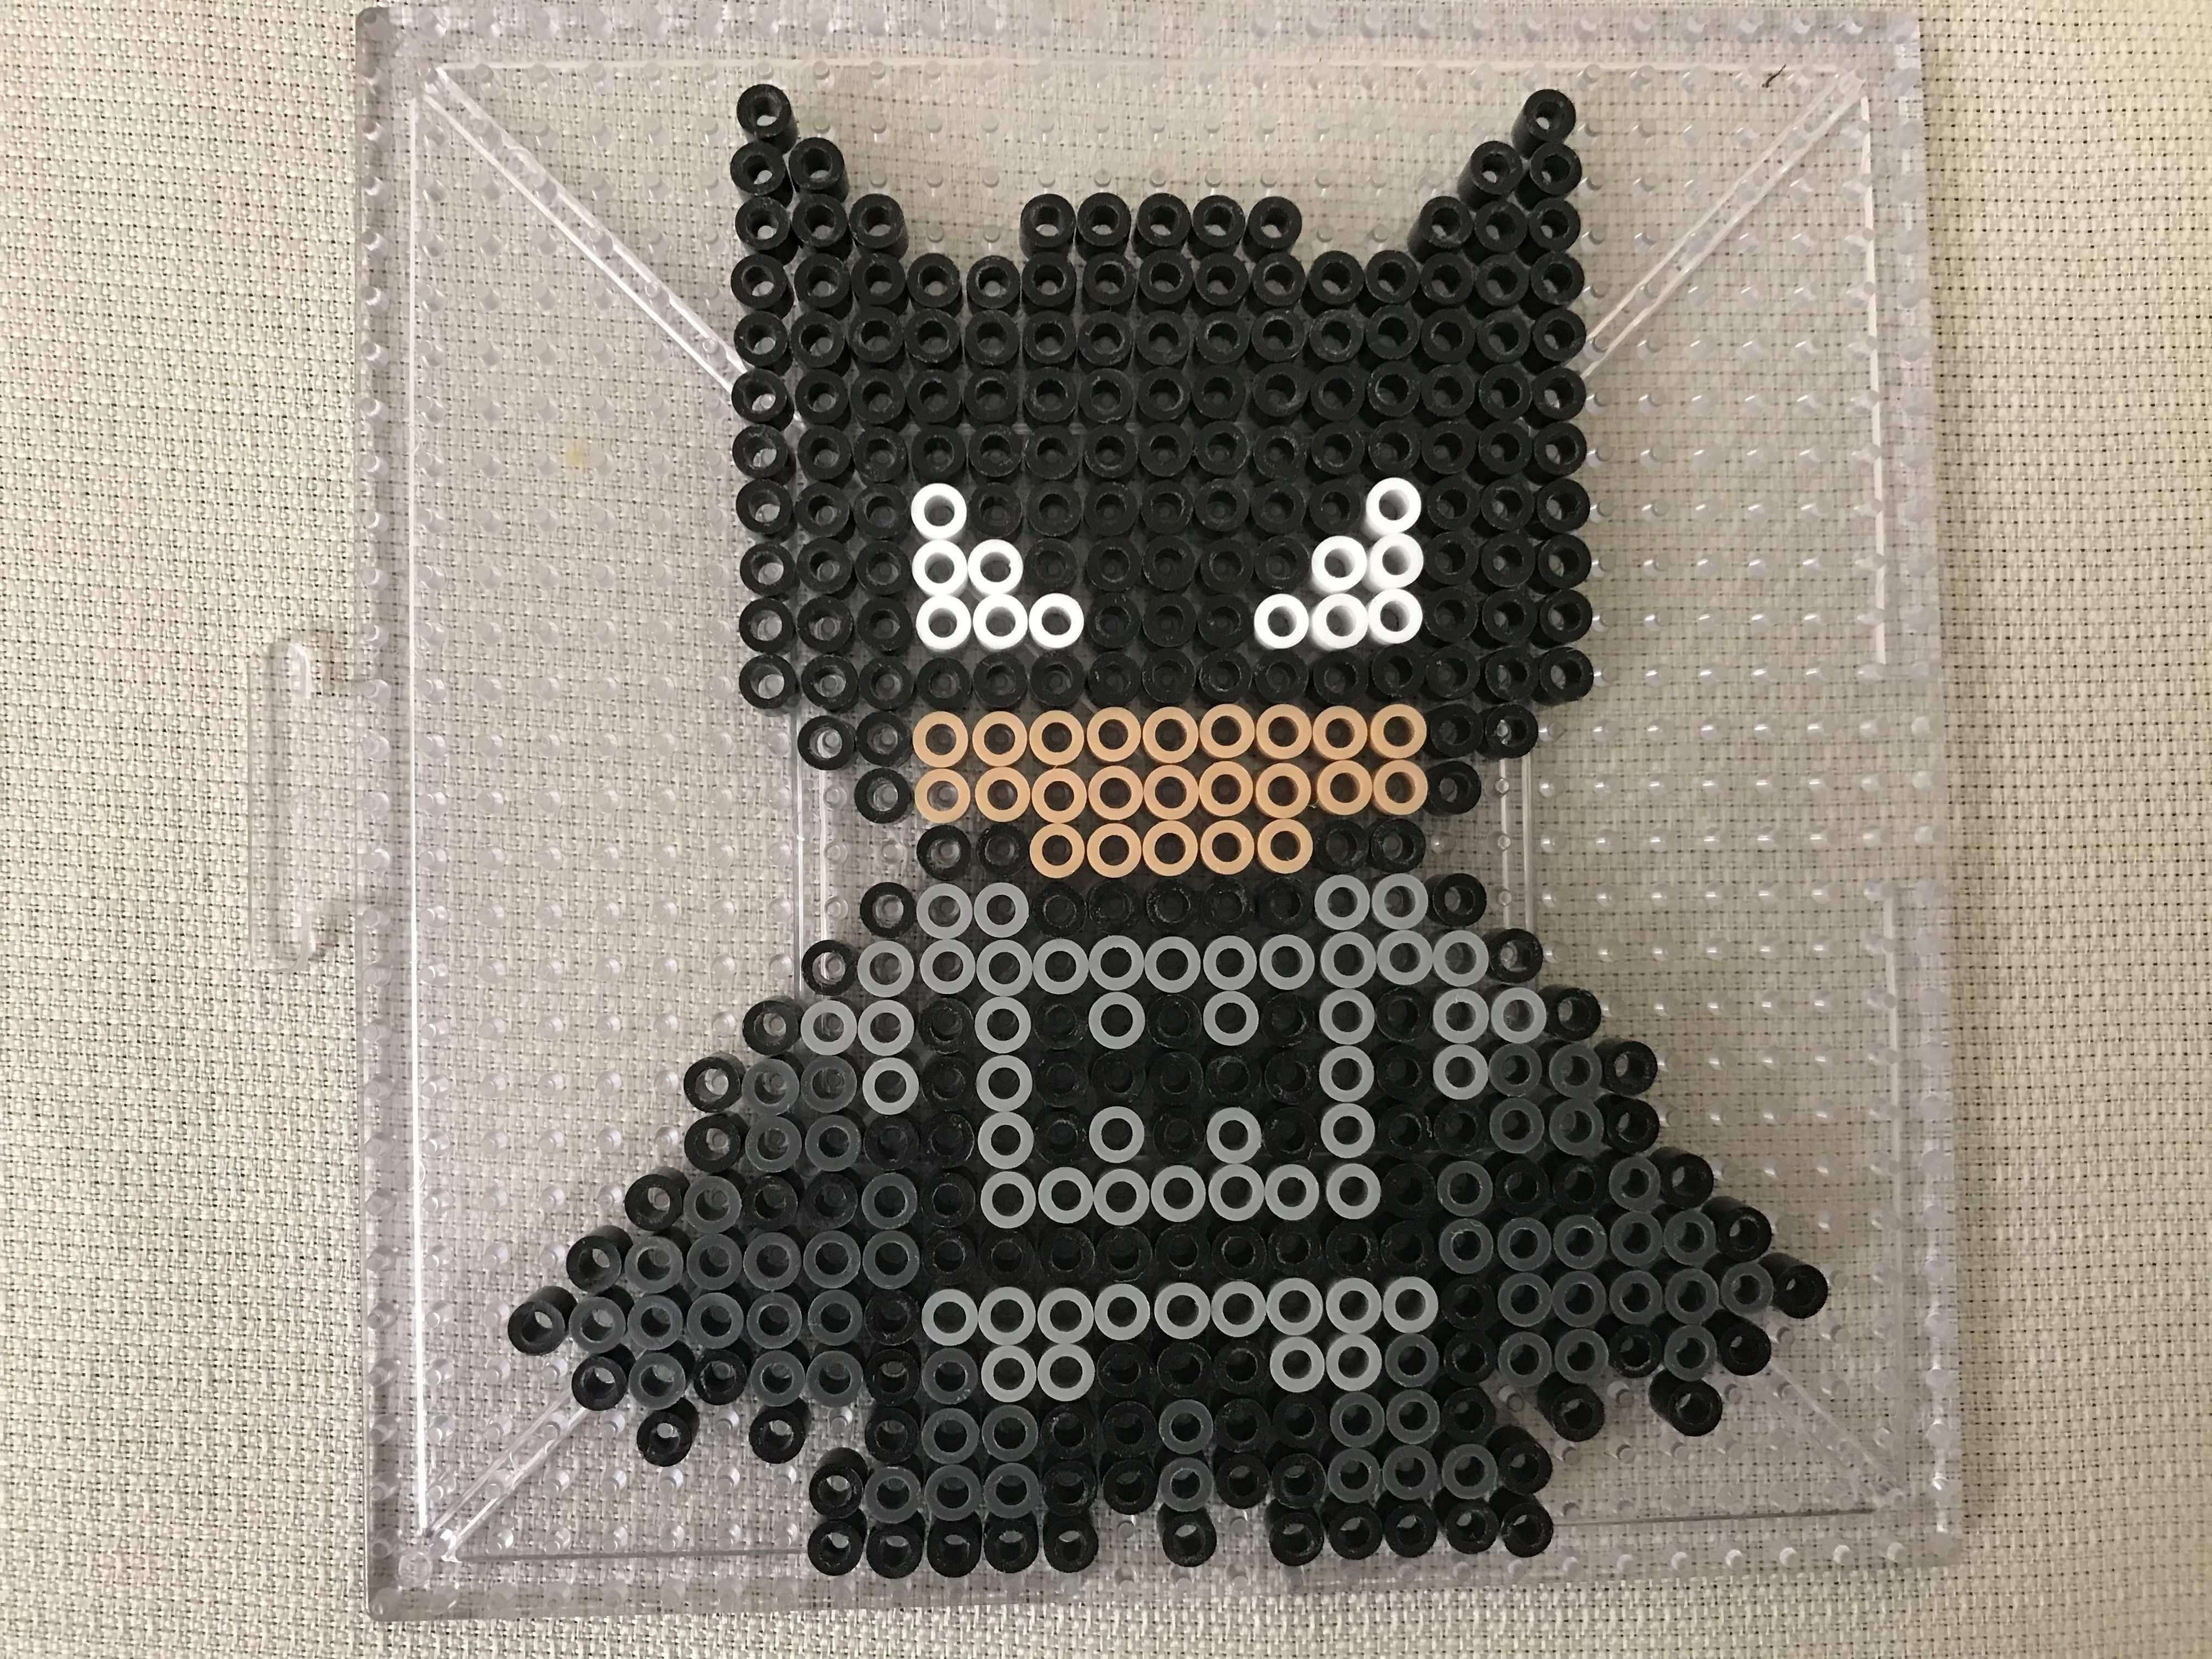 Batman Perler Bead Design Perler Beads Designs Hama Beads Design Hama Beads Patterns